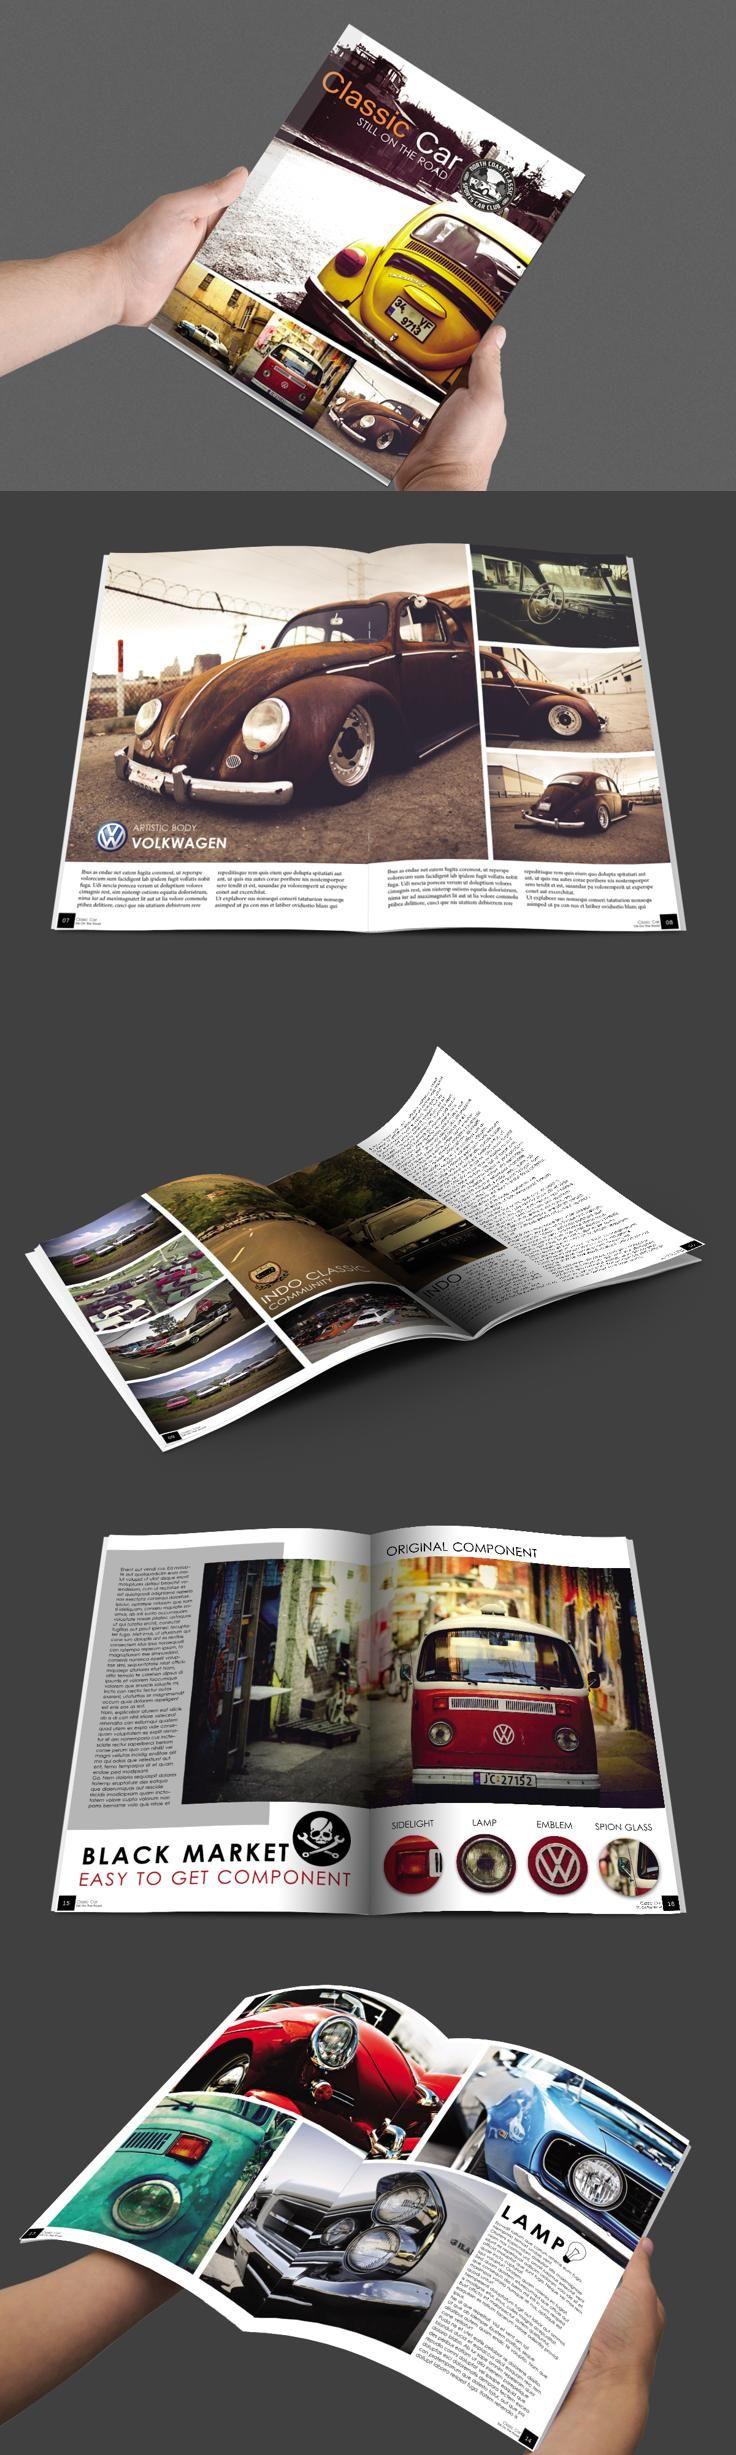 #magazine #design from BoriesBechker   DOWNLOAD: https://creativemarket.com/boriesbechker/289069-OldSchool-Car-Magazine?u=zsoltczigler